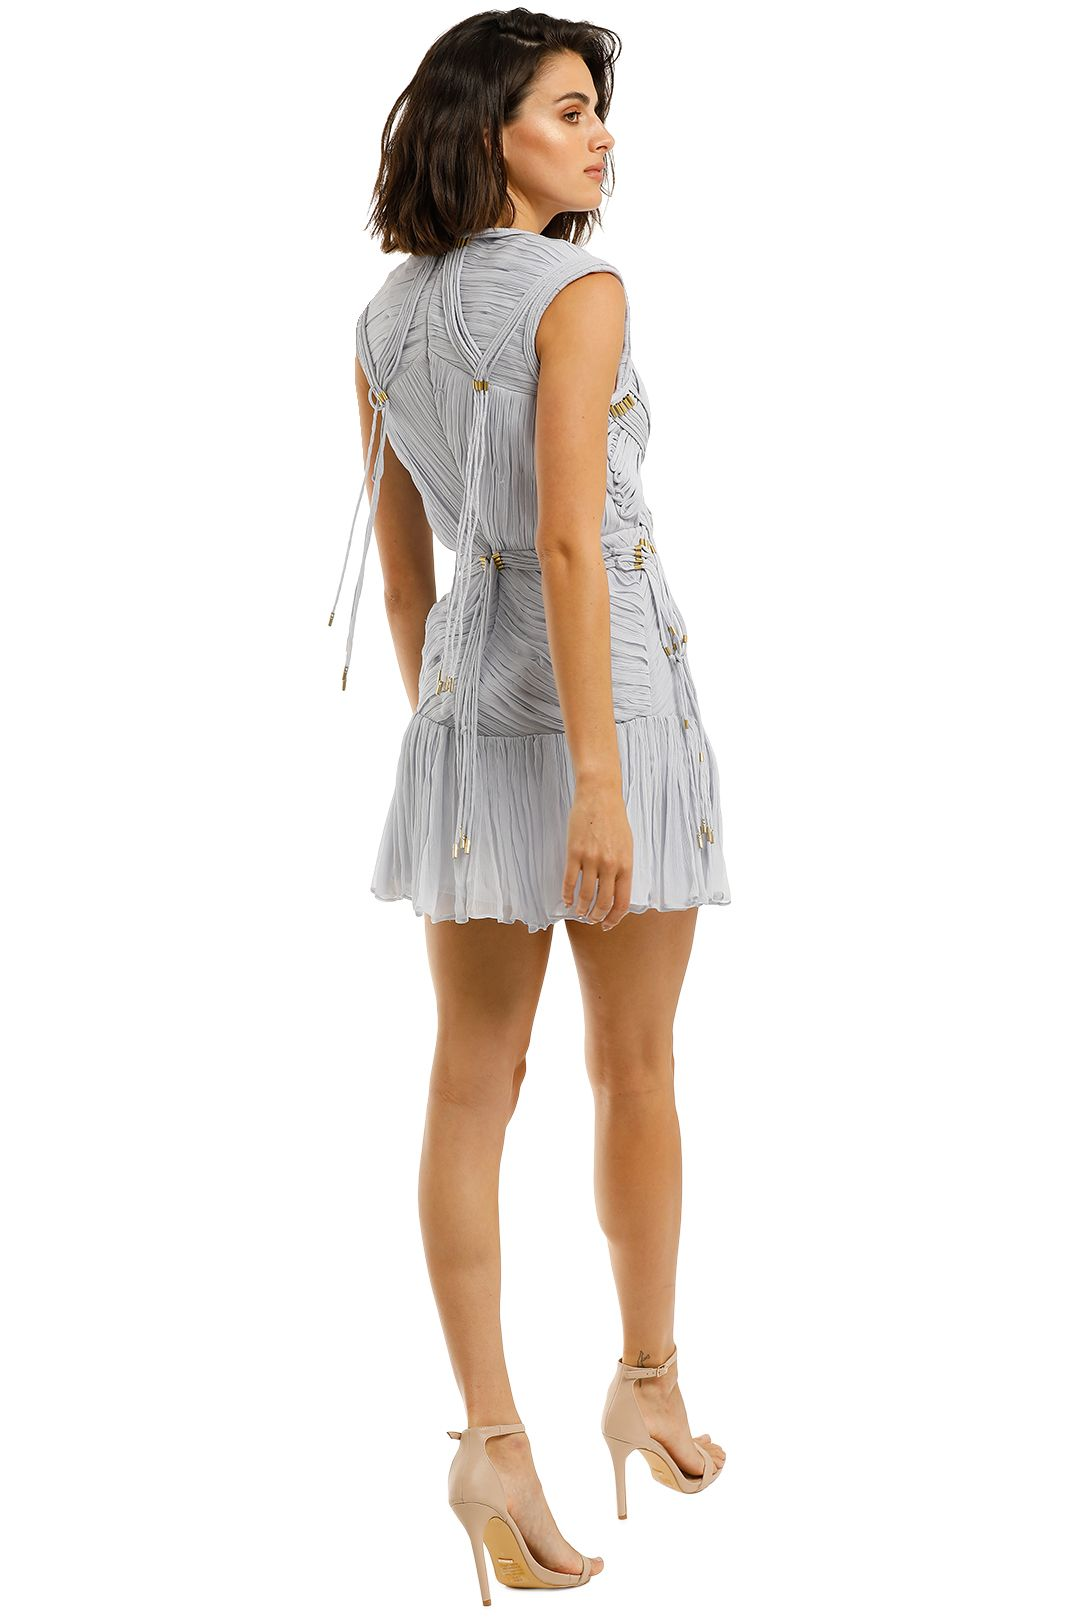 Thurley-Atlantis-Dress-Xenon-Blue-Back